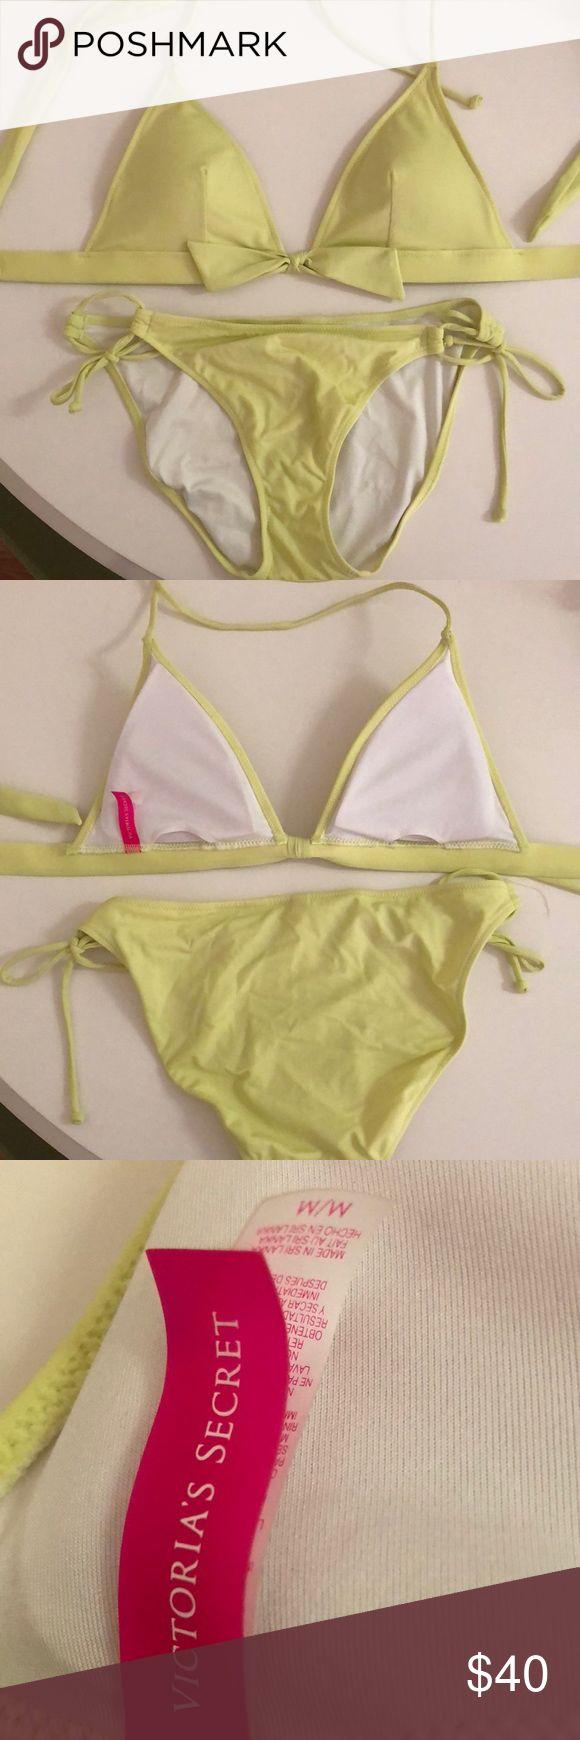 VS bikini set Light lime green halter bikini top and string tie bottoms. Worn a couple of times. Victoria's Secret Swim Bikinis